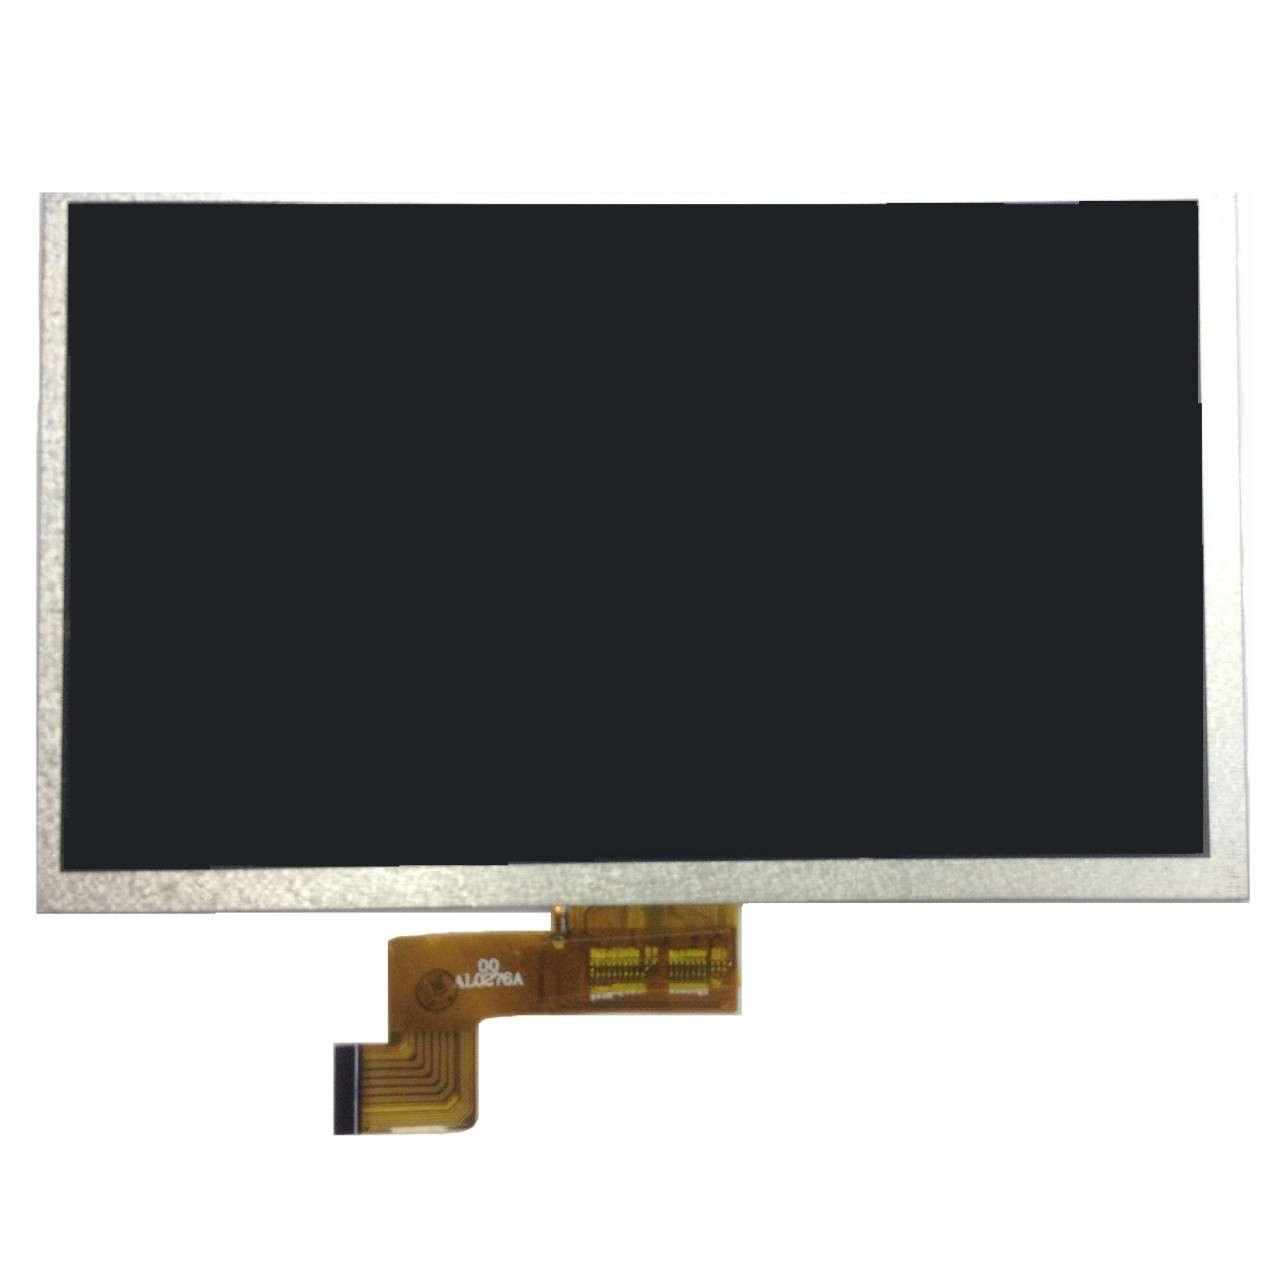 Display Myria Elite 900M Ecran TN LCD Tableta imagine powerlaptop.ro 2021